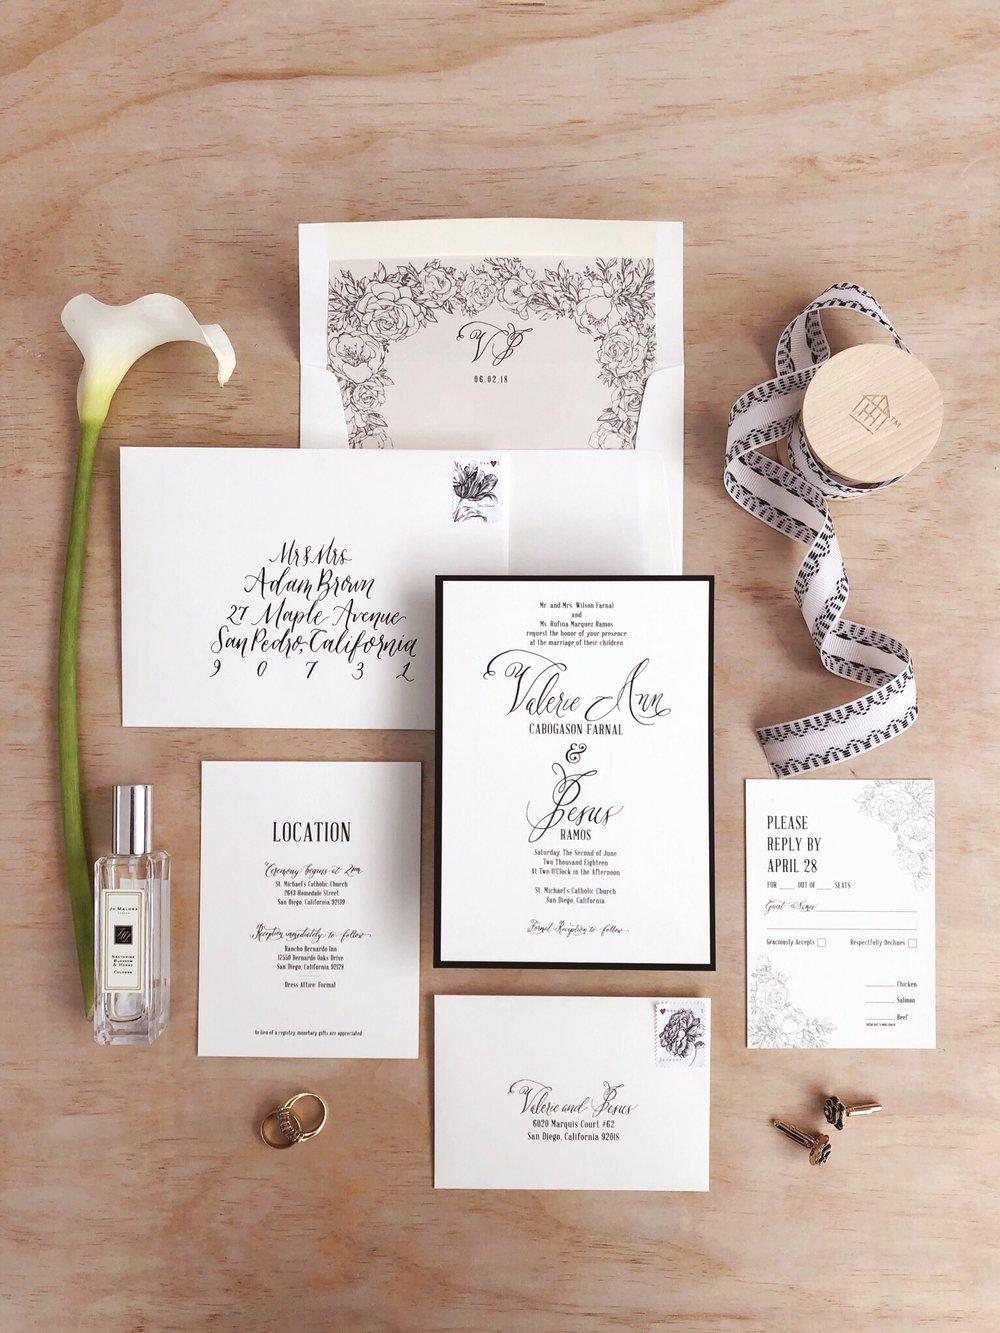 Classy Black and White Calligraphy Wedding Invitation.JPG